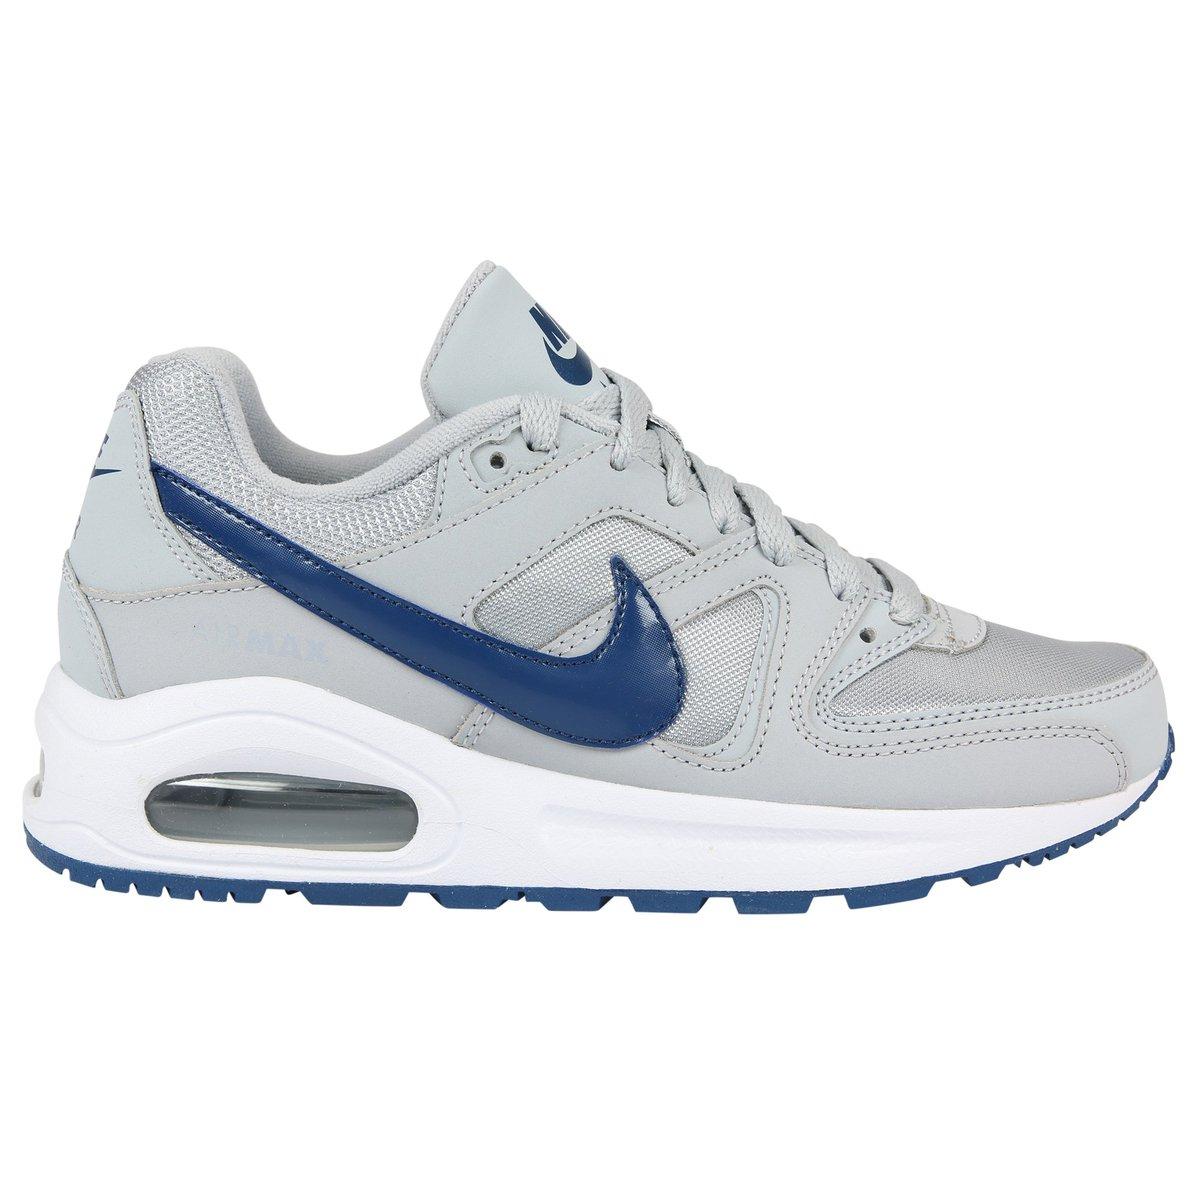 Nike Presto GS Schuhe Turnschuhe Sneaker Jungen Madchen 833875 011 Schwarz